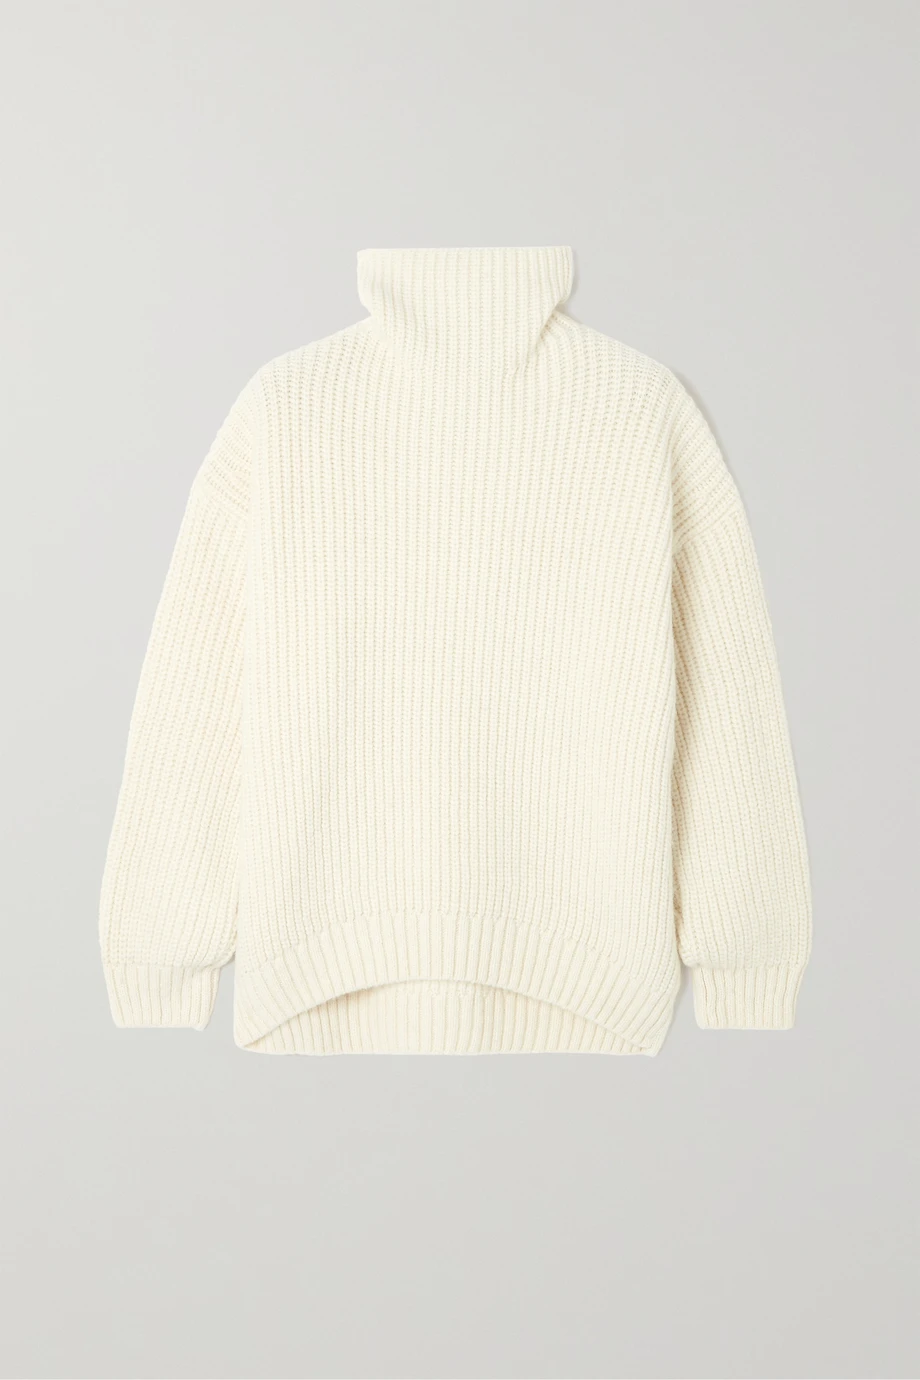 Sydney - Sweater